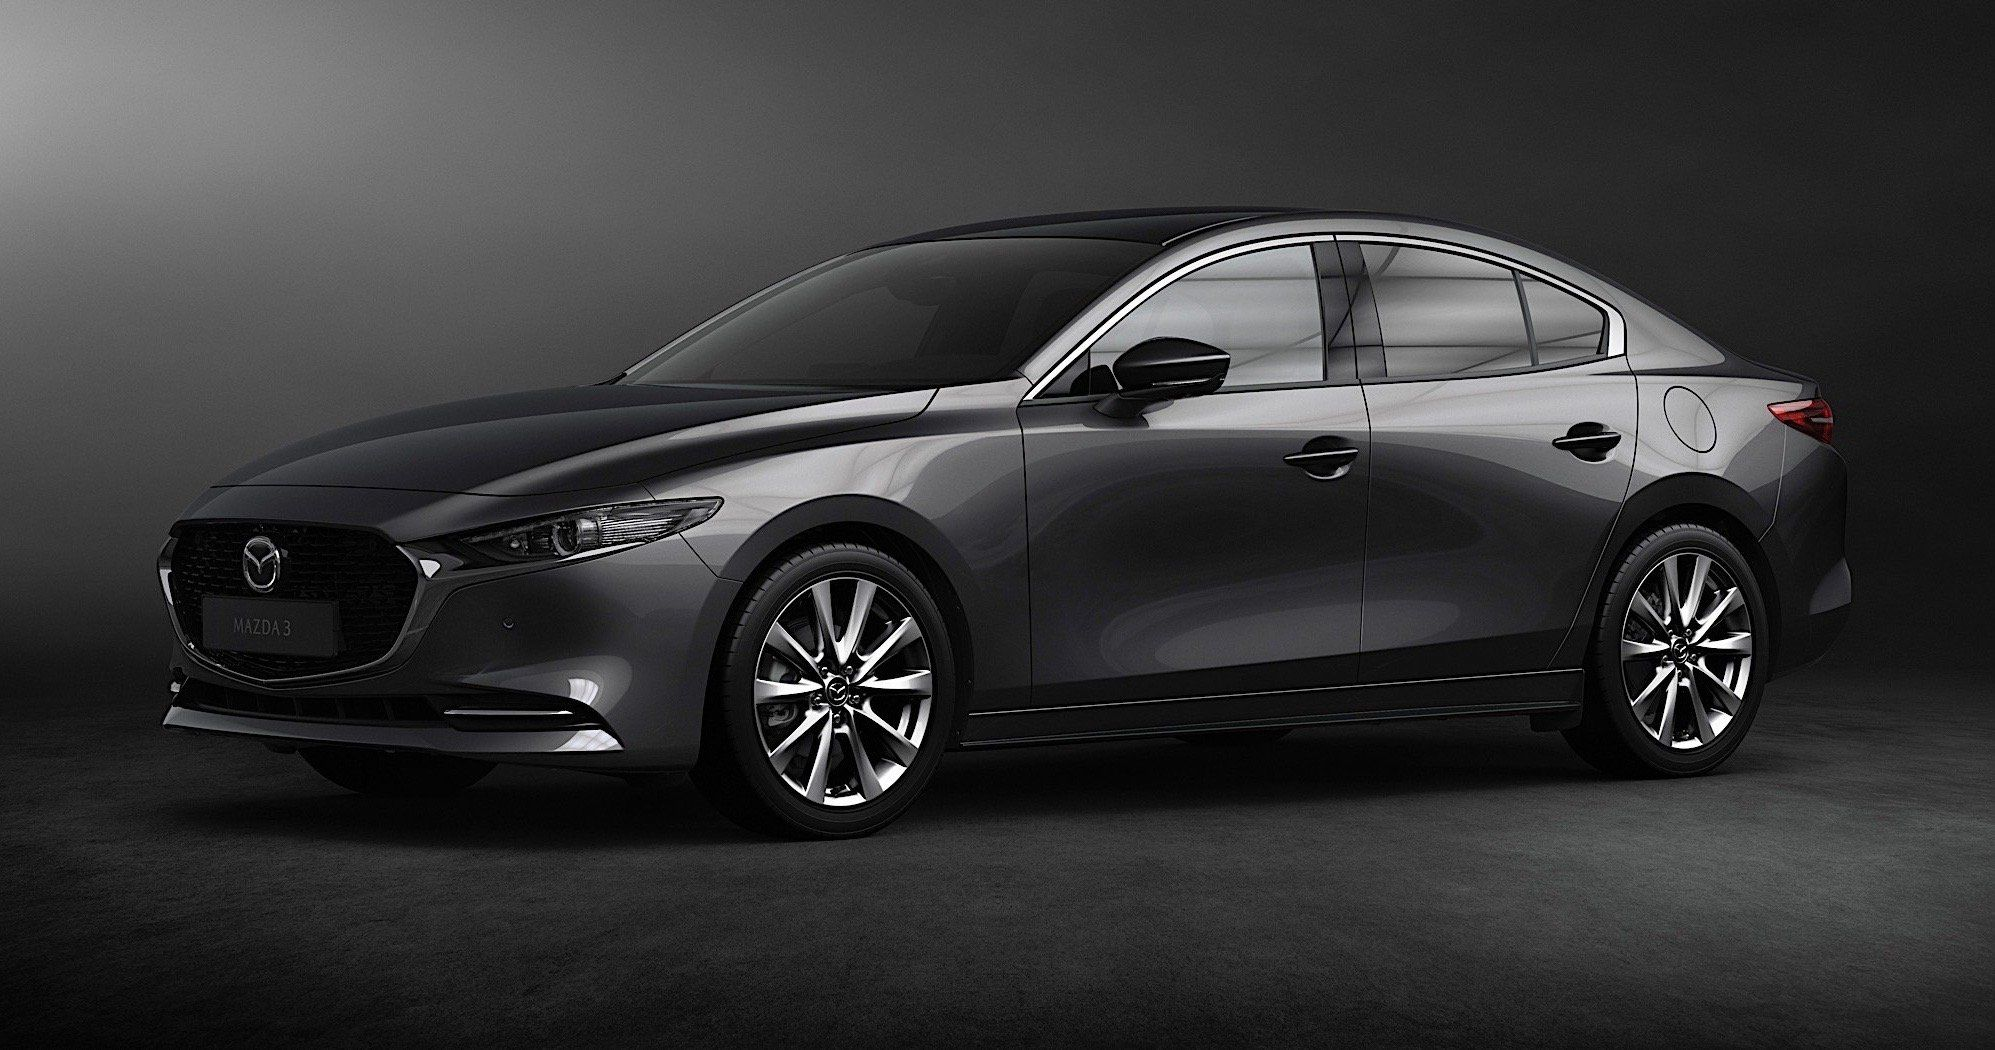 Kelebihan Mazda 3 Skyactiv G Perbandingan Harga